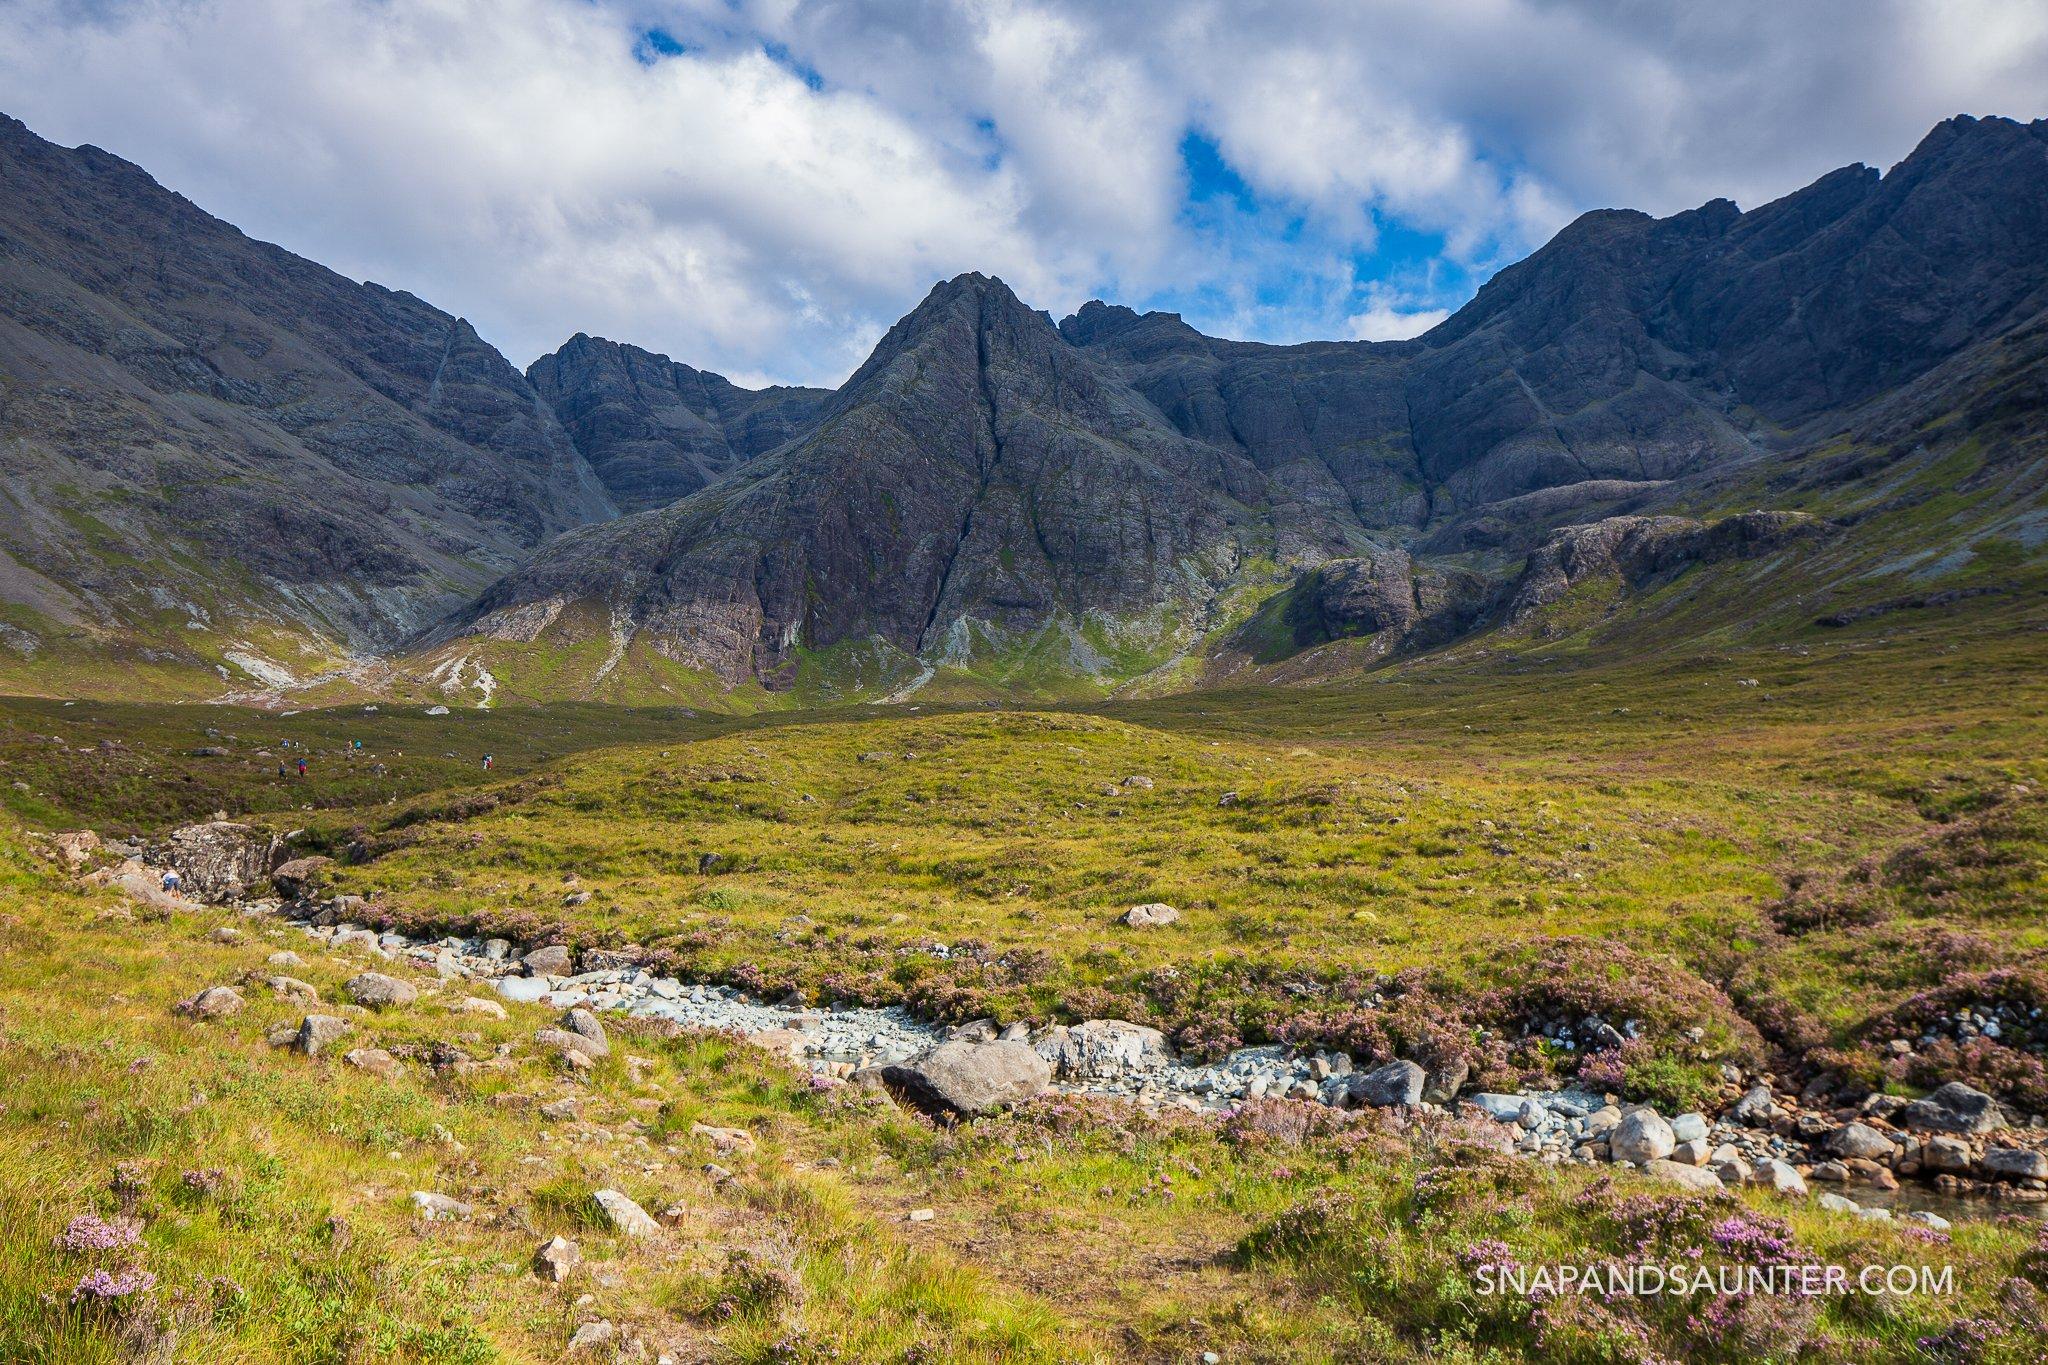 Sgurr an Fheadain on Isle of Skye